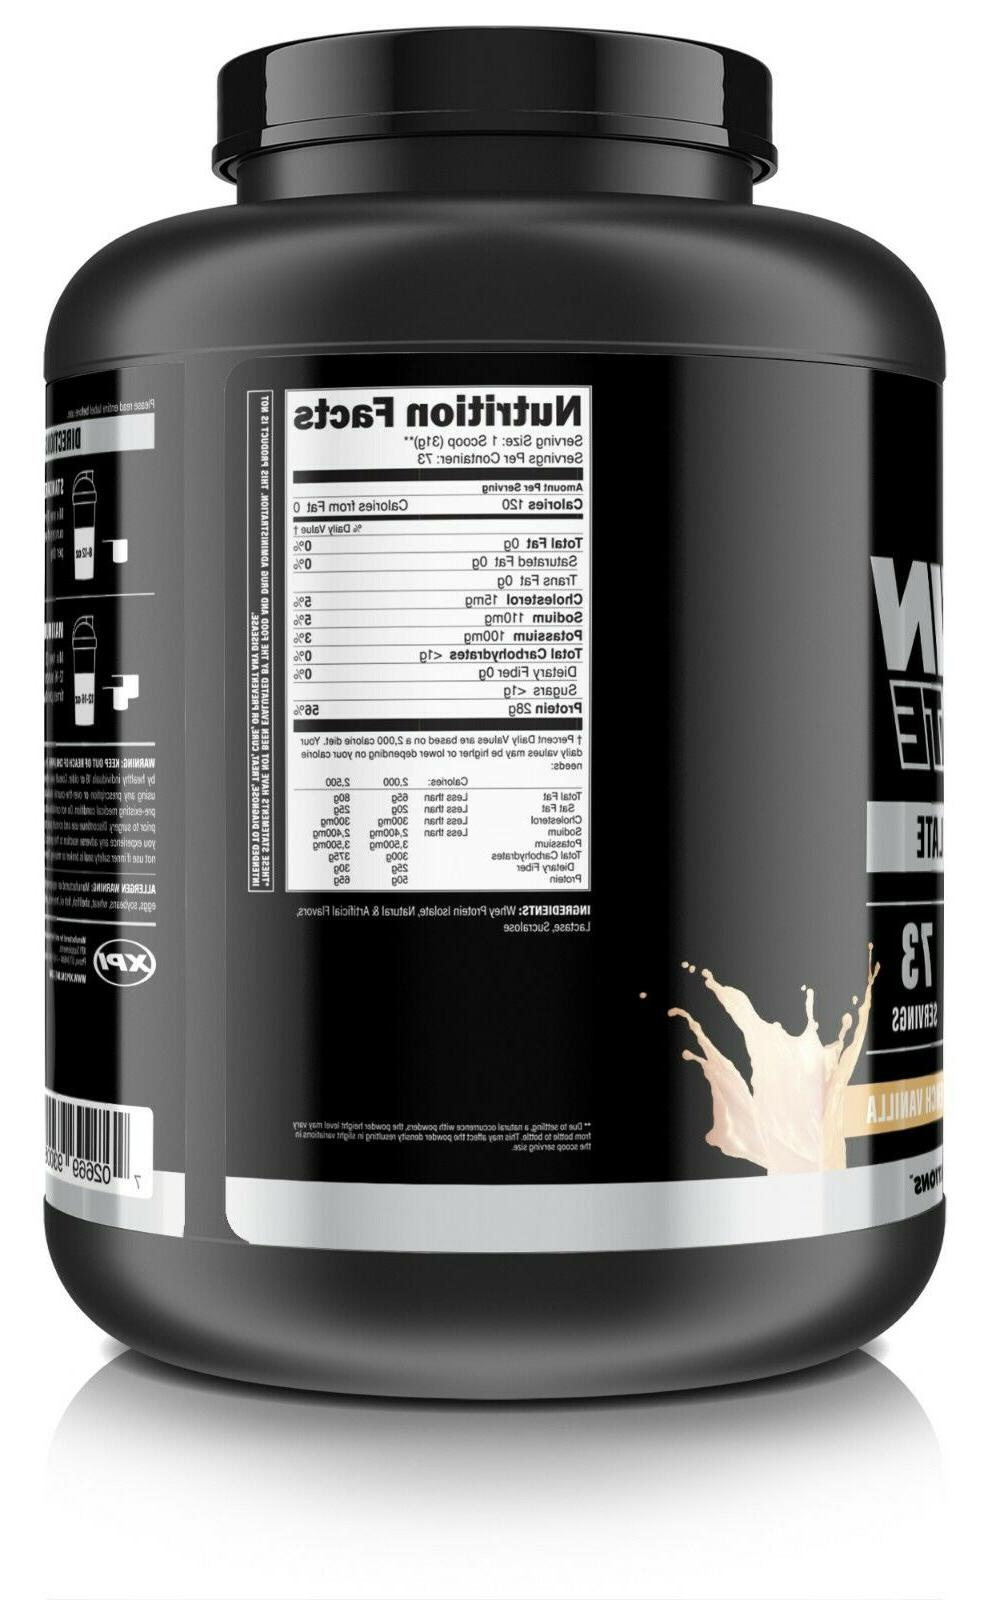 XPI Isolate Powder 5LBS